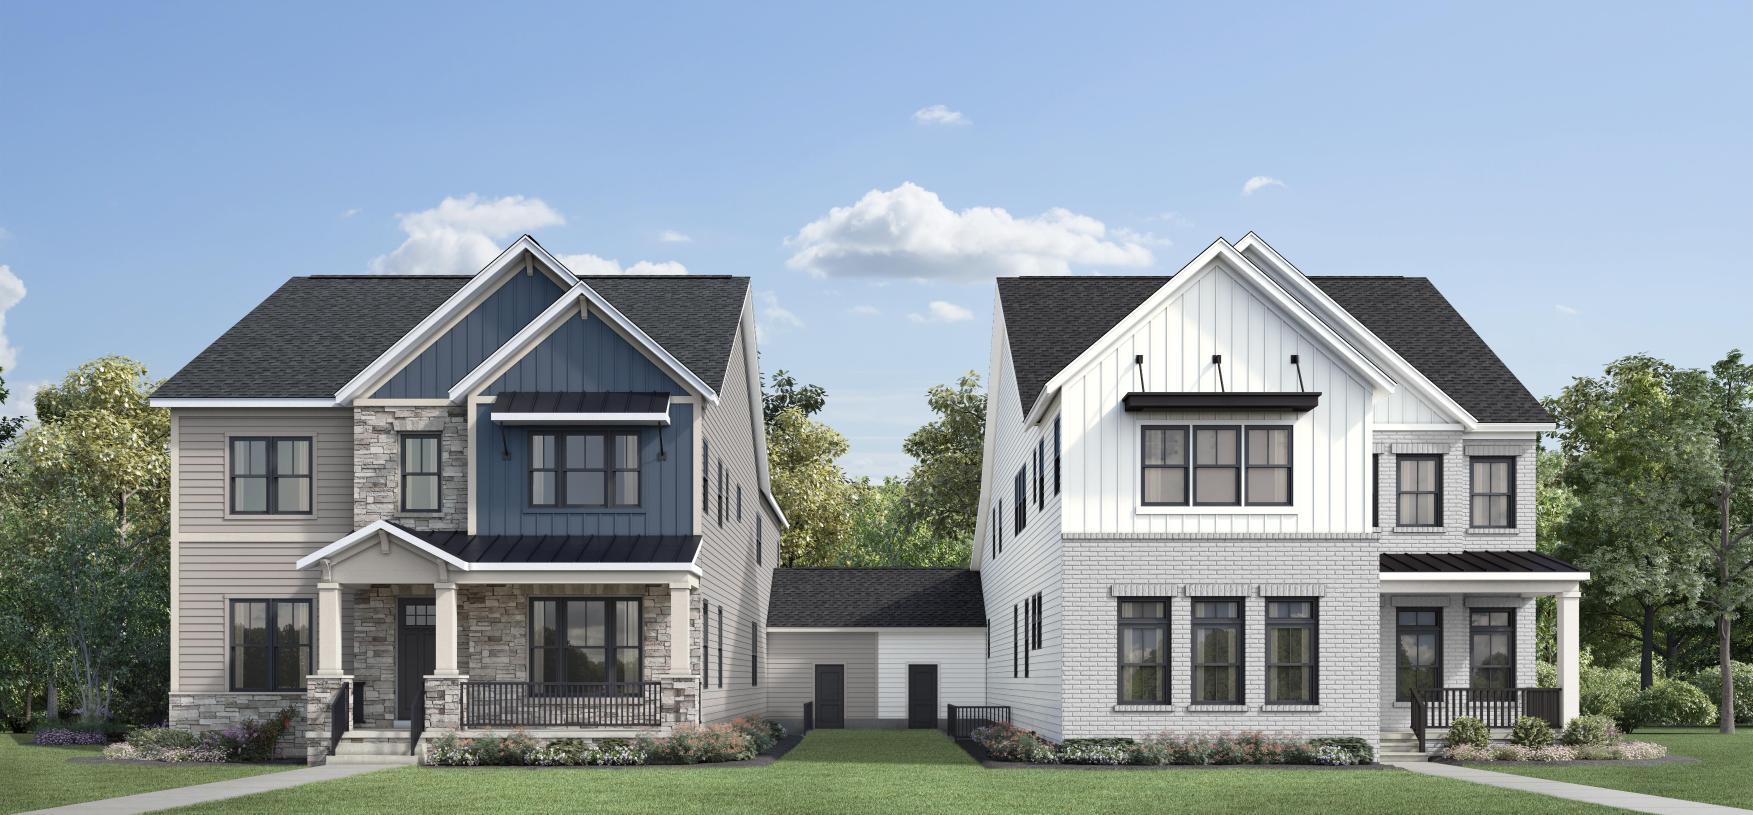 Attached exterior design options